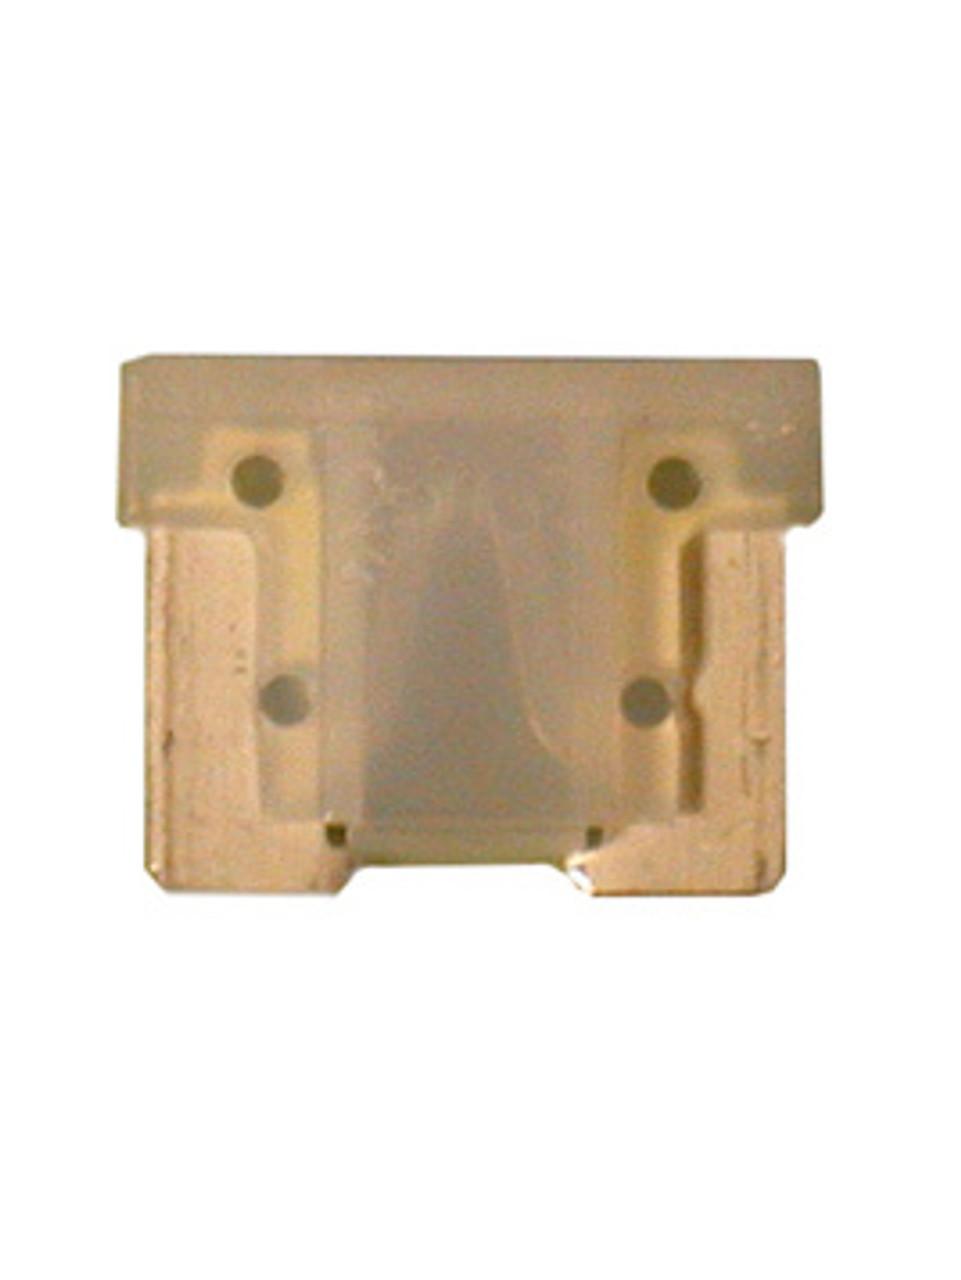 ATC25MLP --- Low Profile Mini Fuses